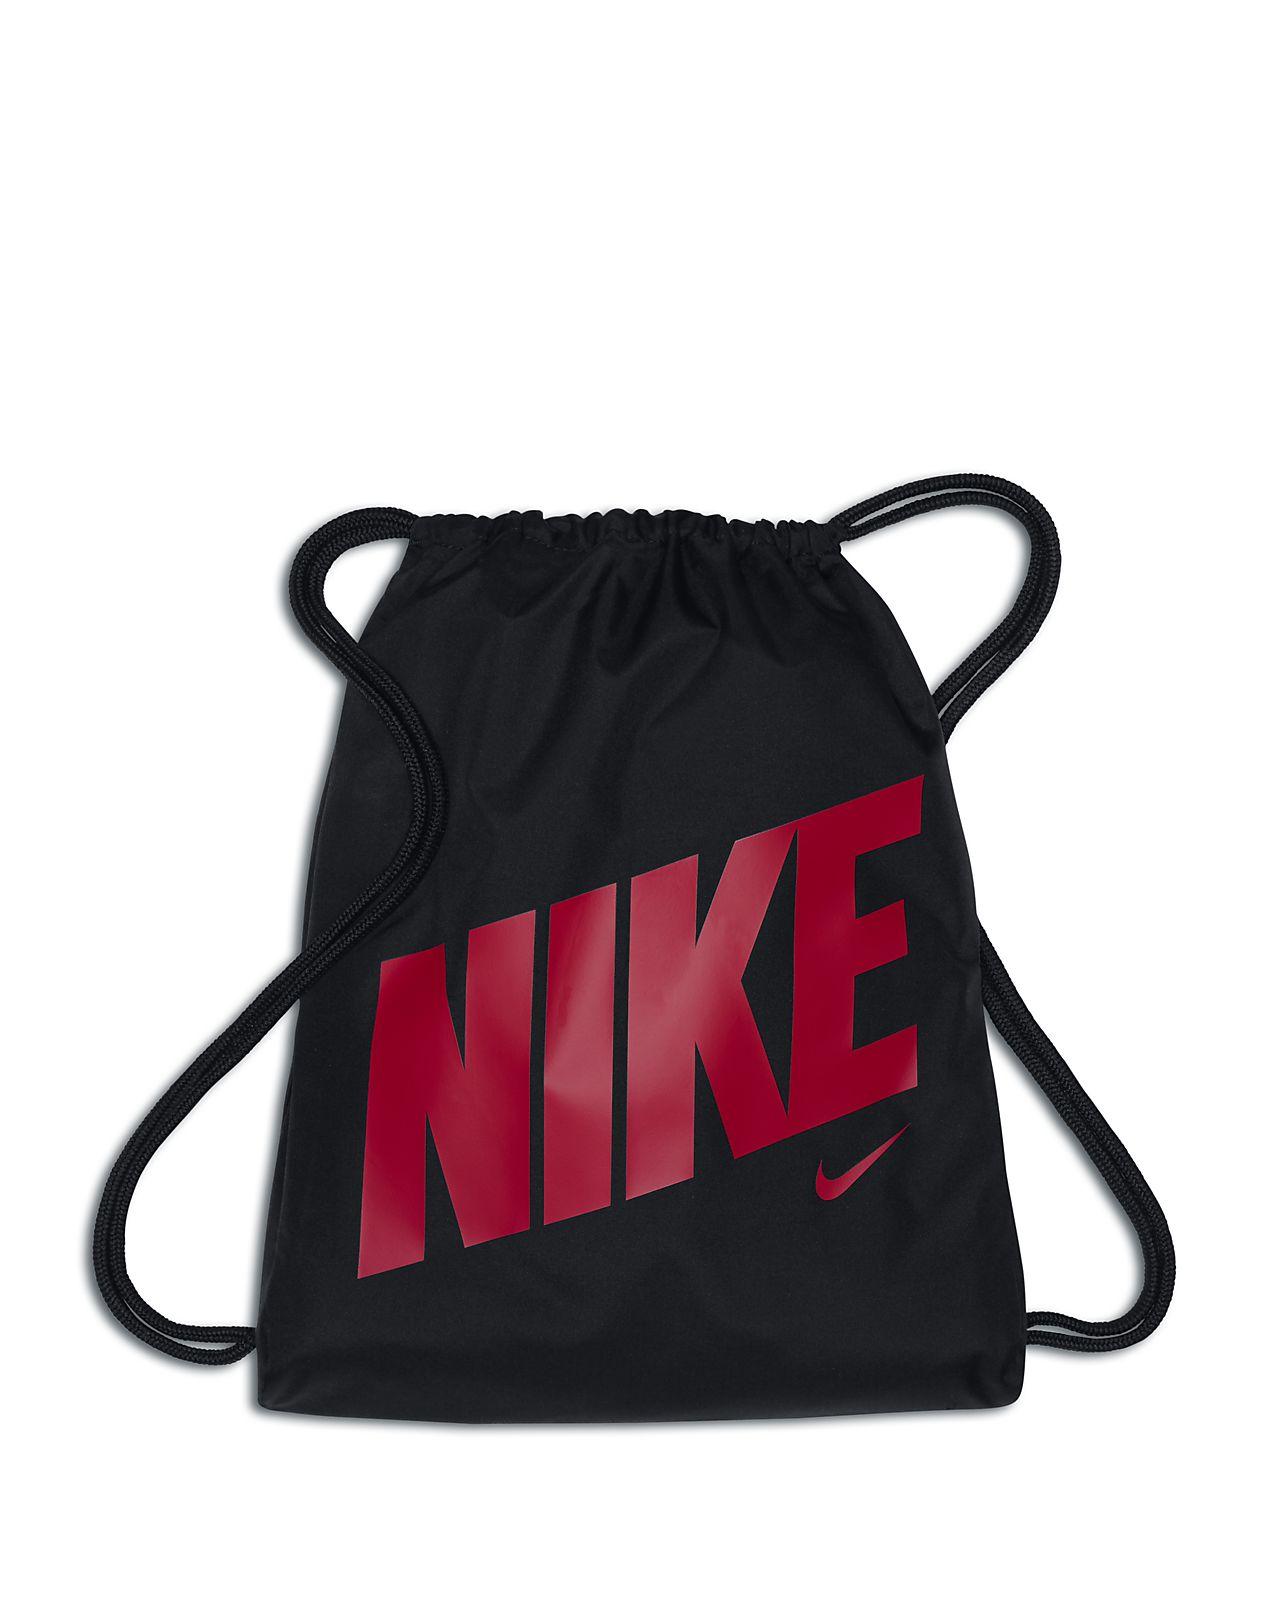 Nike Graphic Kids' Gym Sack